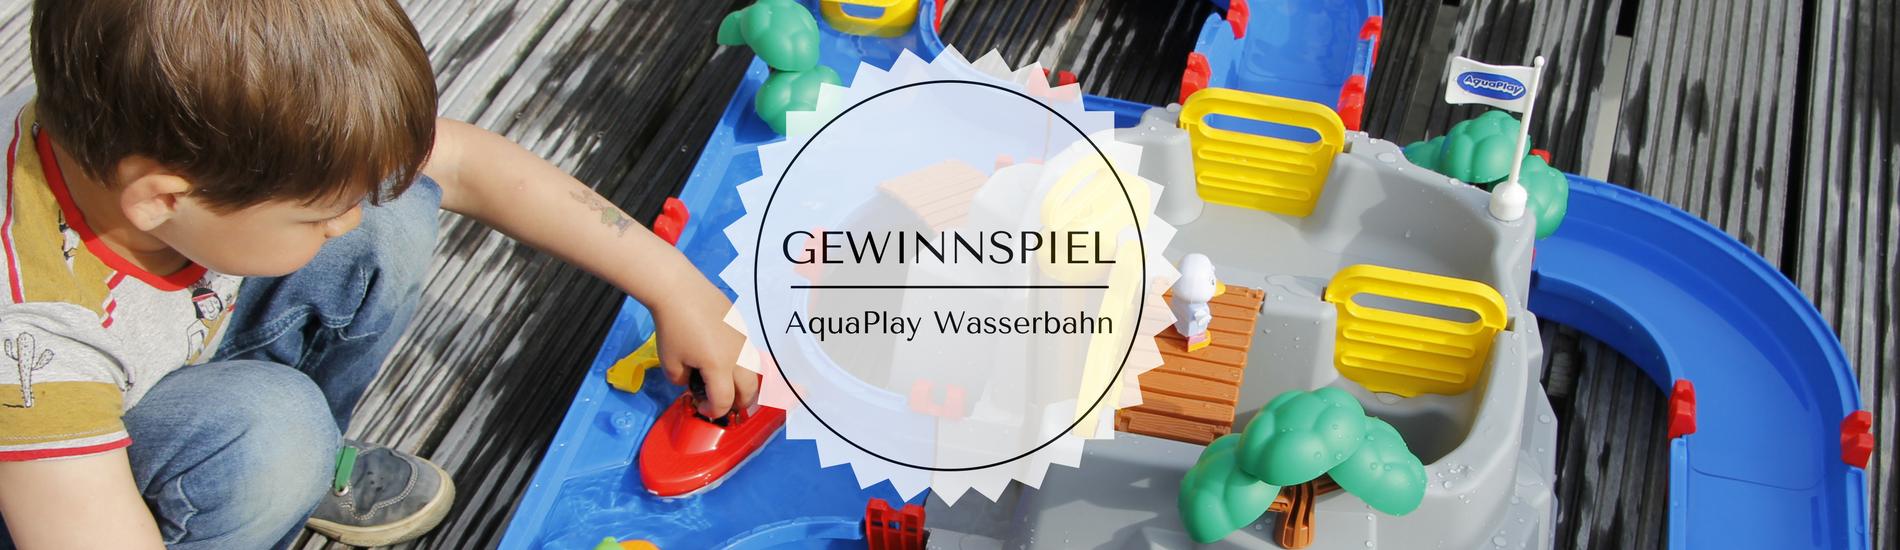 Gewinnspiel AquaPlay